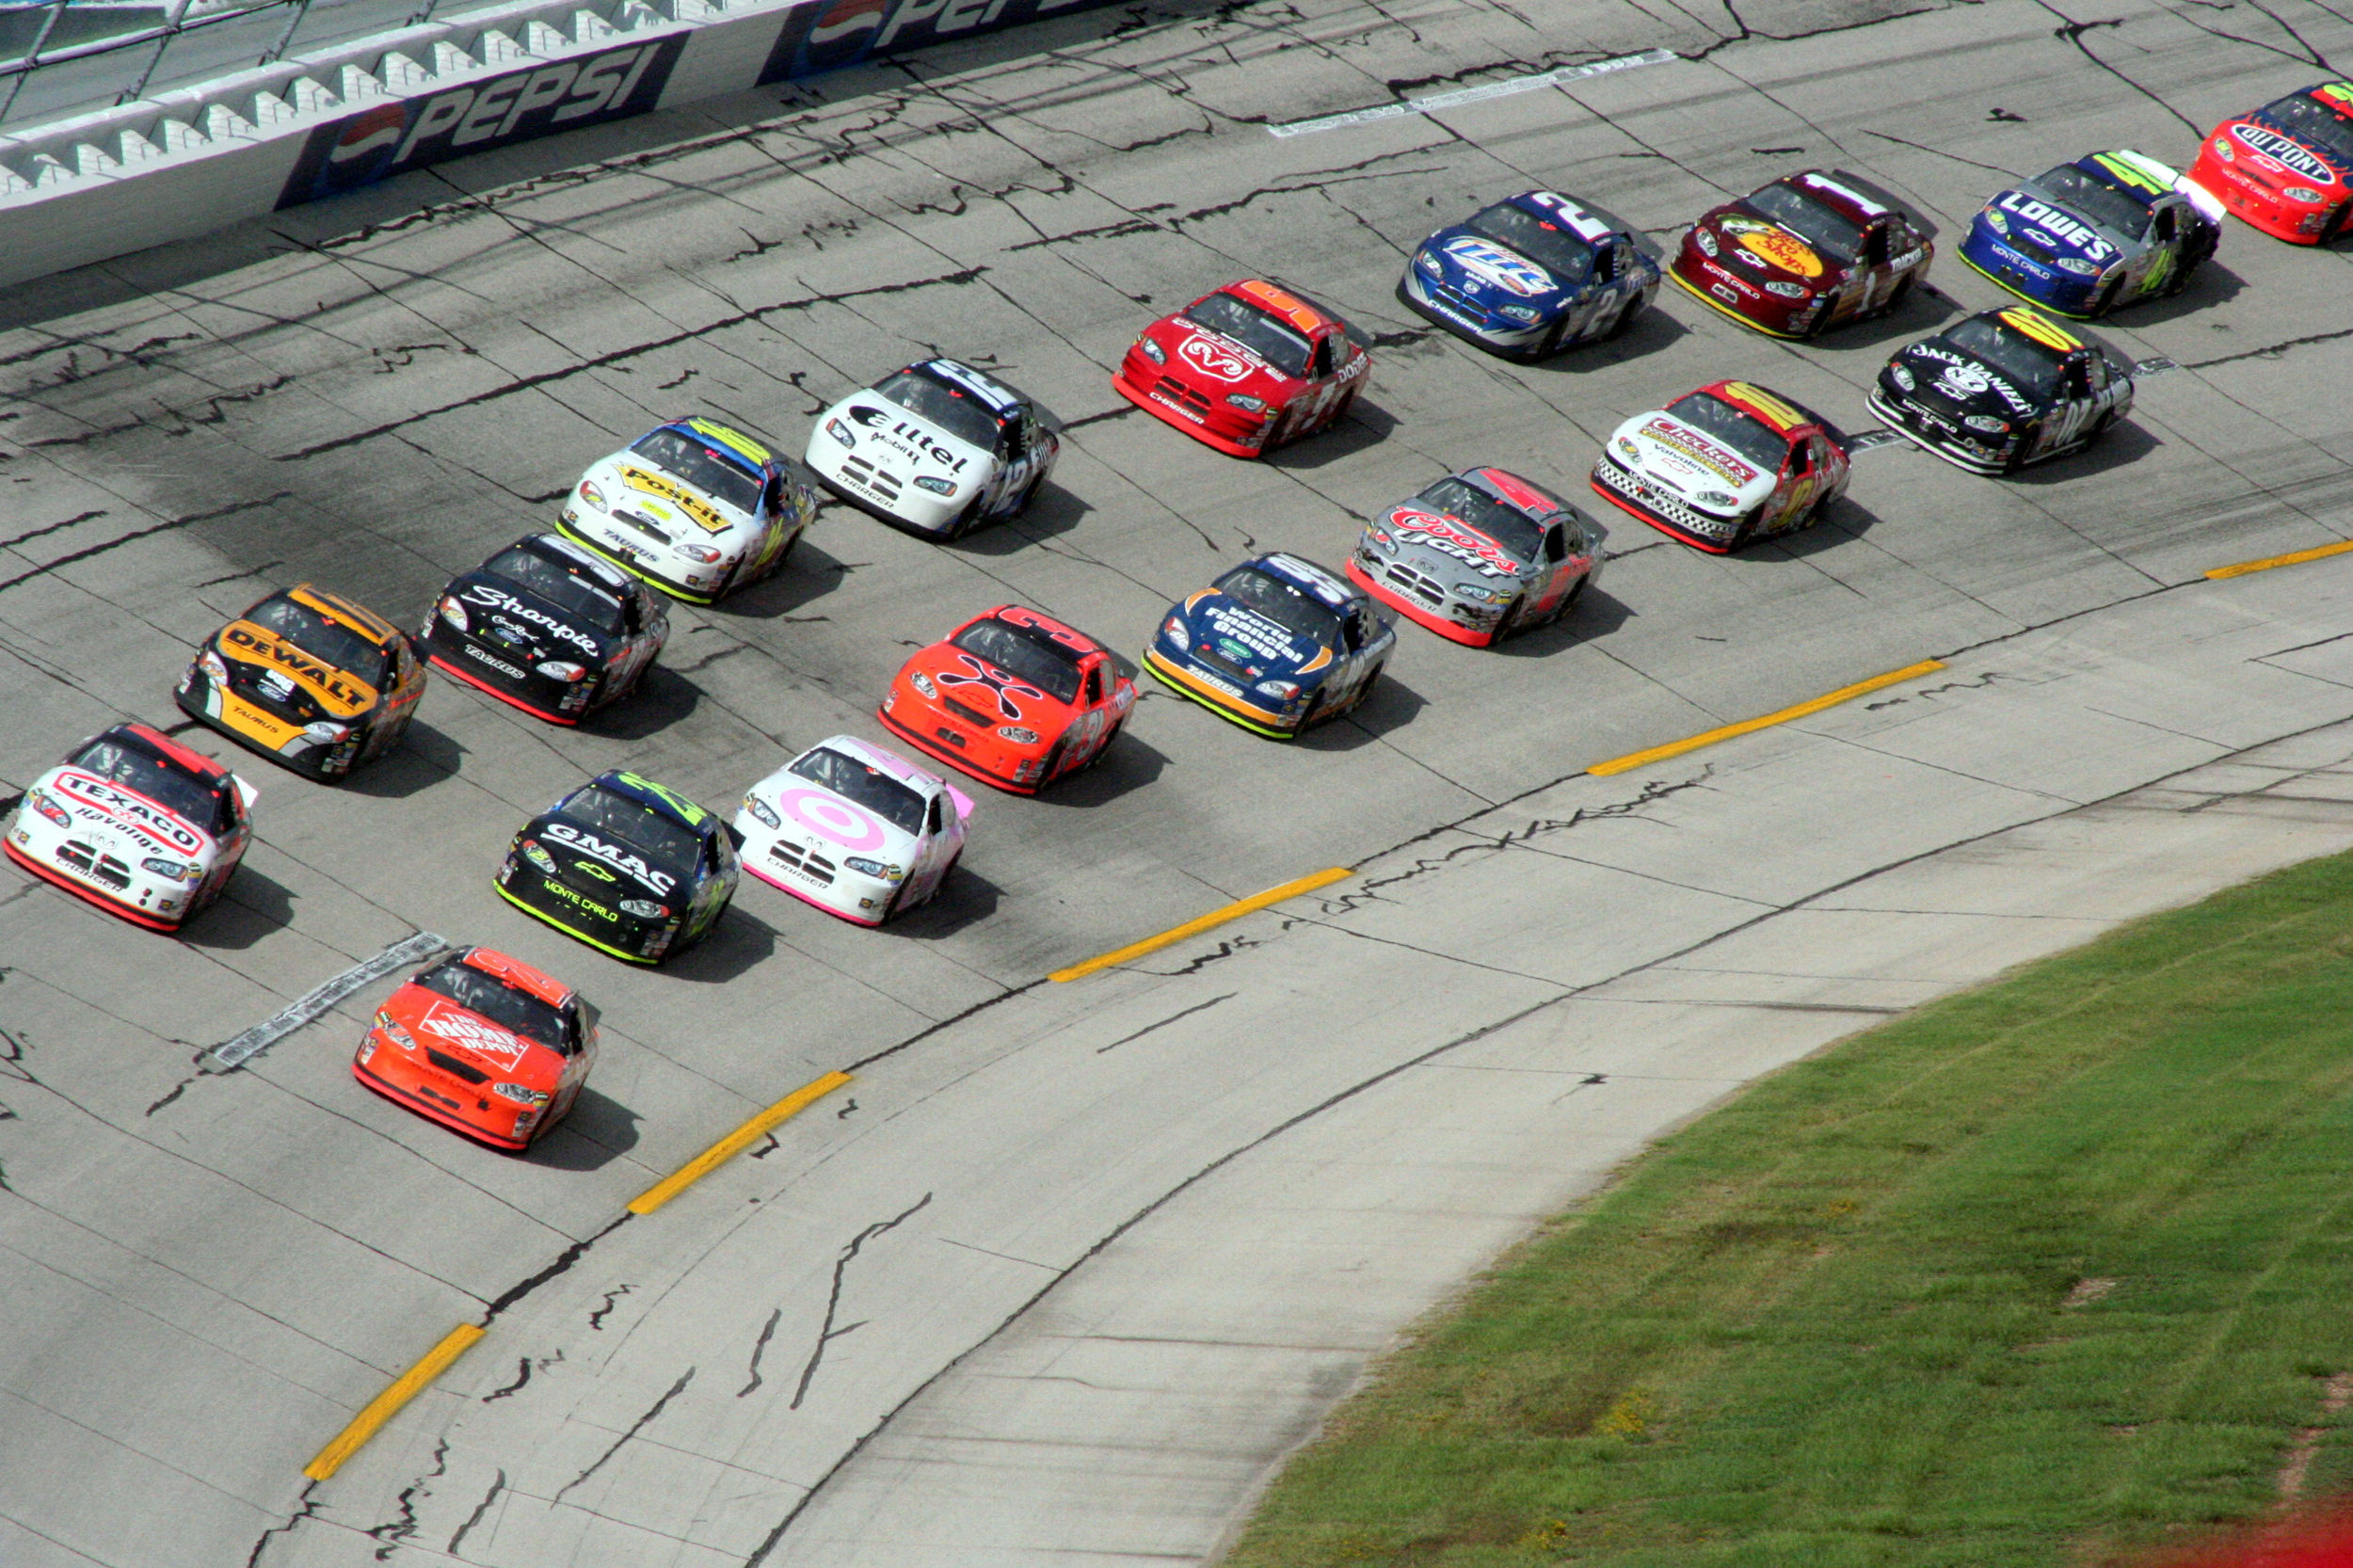 Fiat Of Glendale >> NASCAR 101- How Does NASCAR work? - Zero To 60 Times